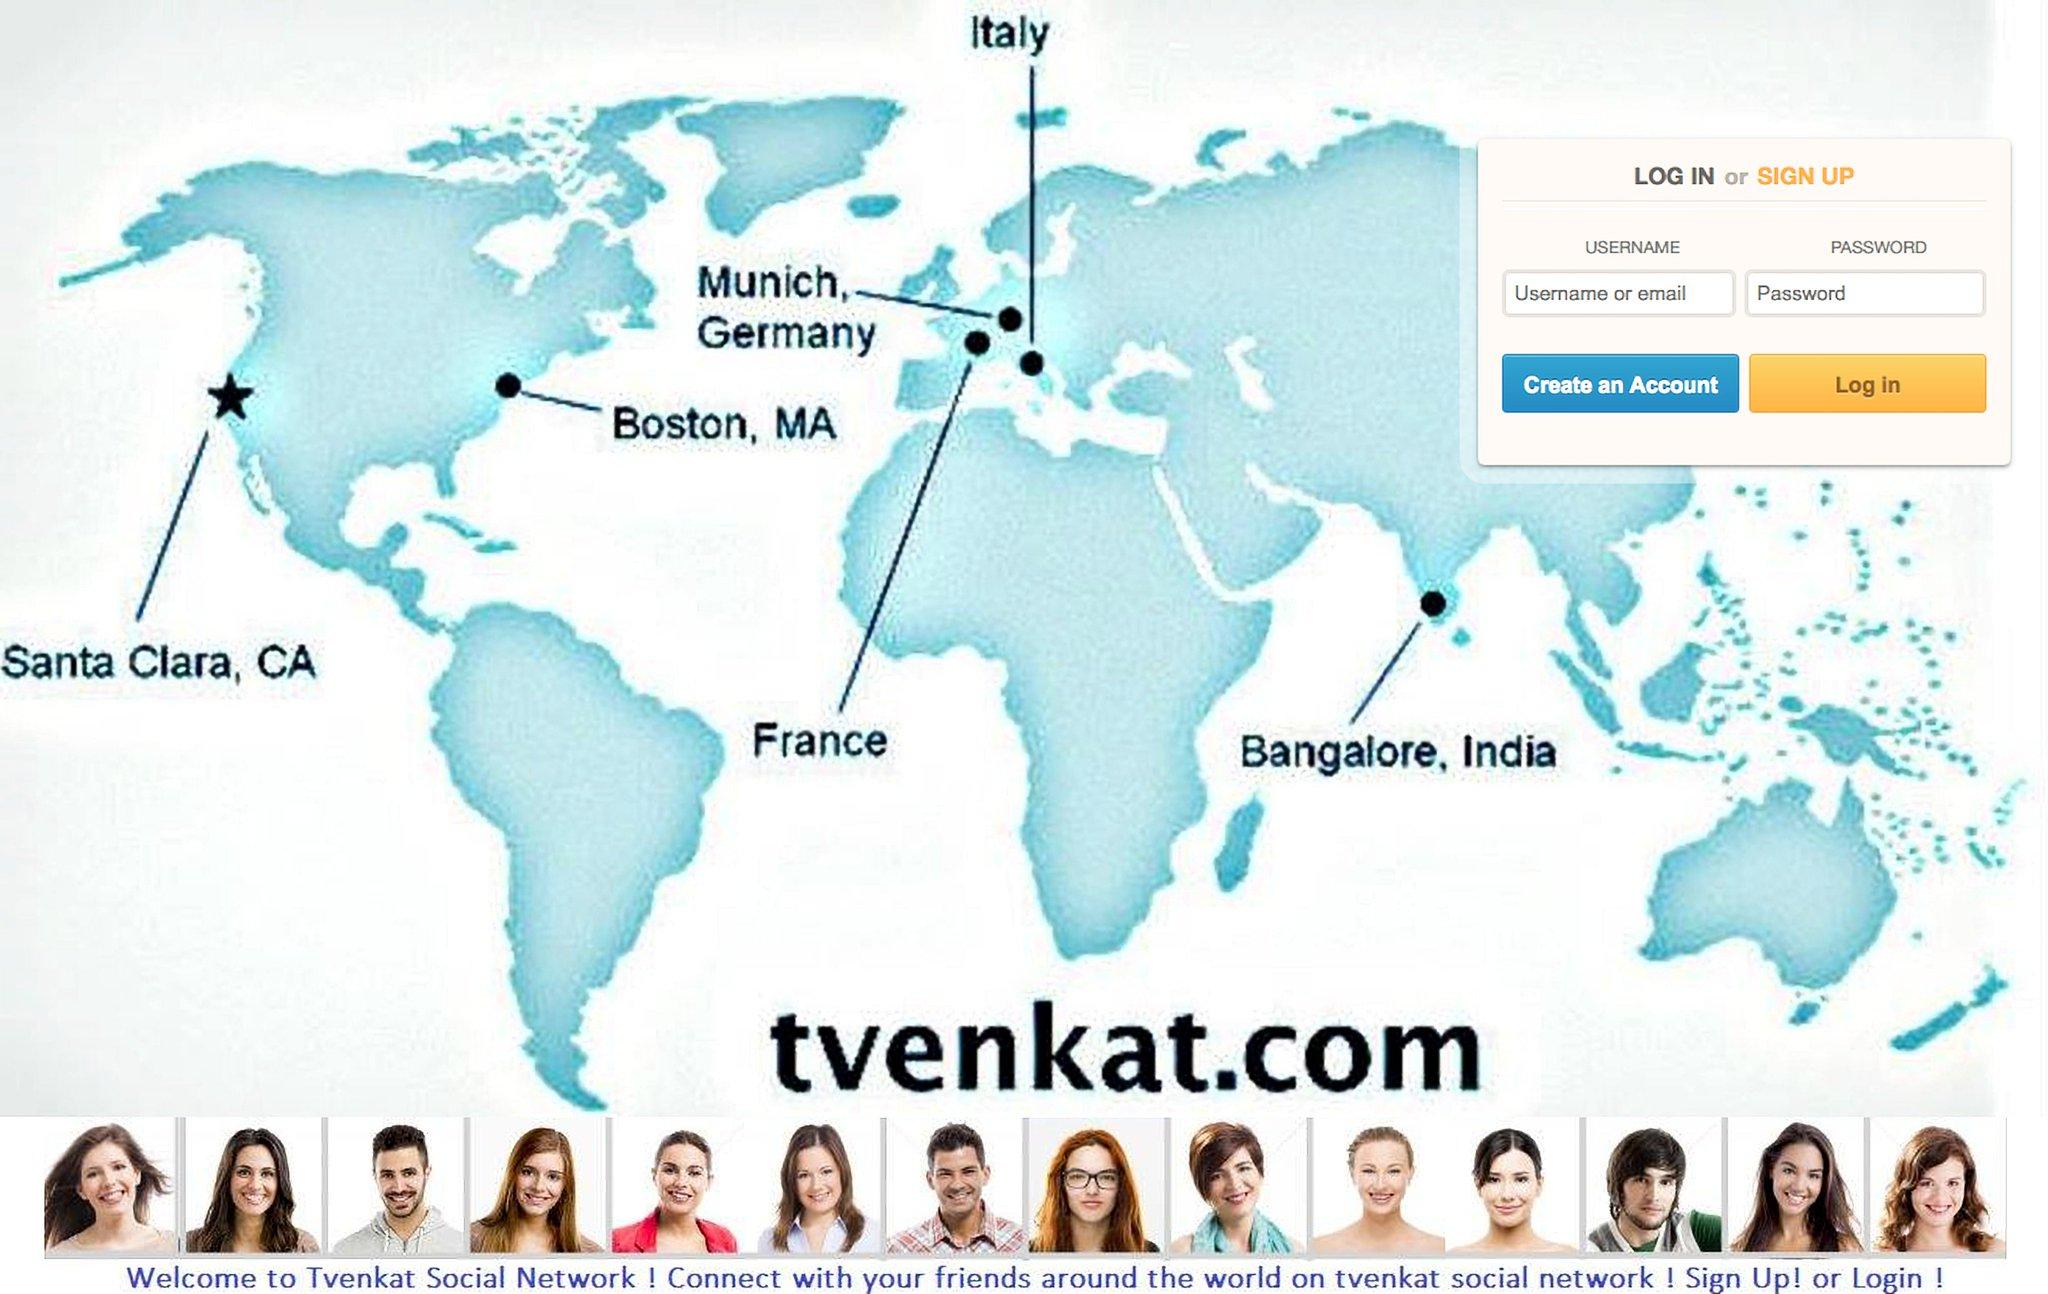 www.tvenkat.com